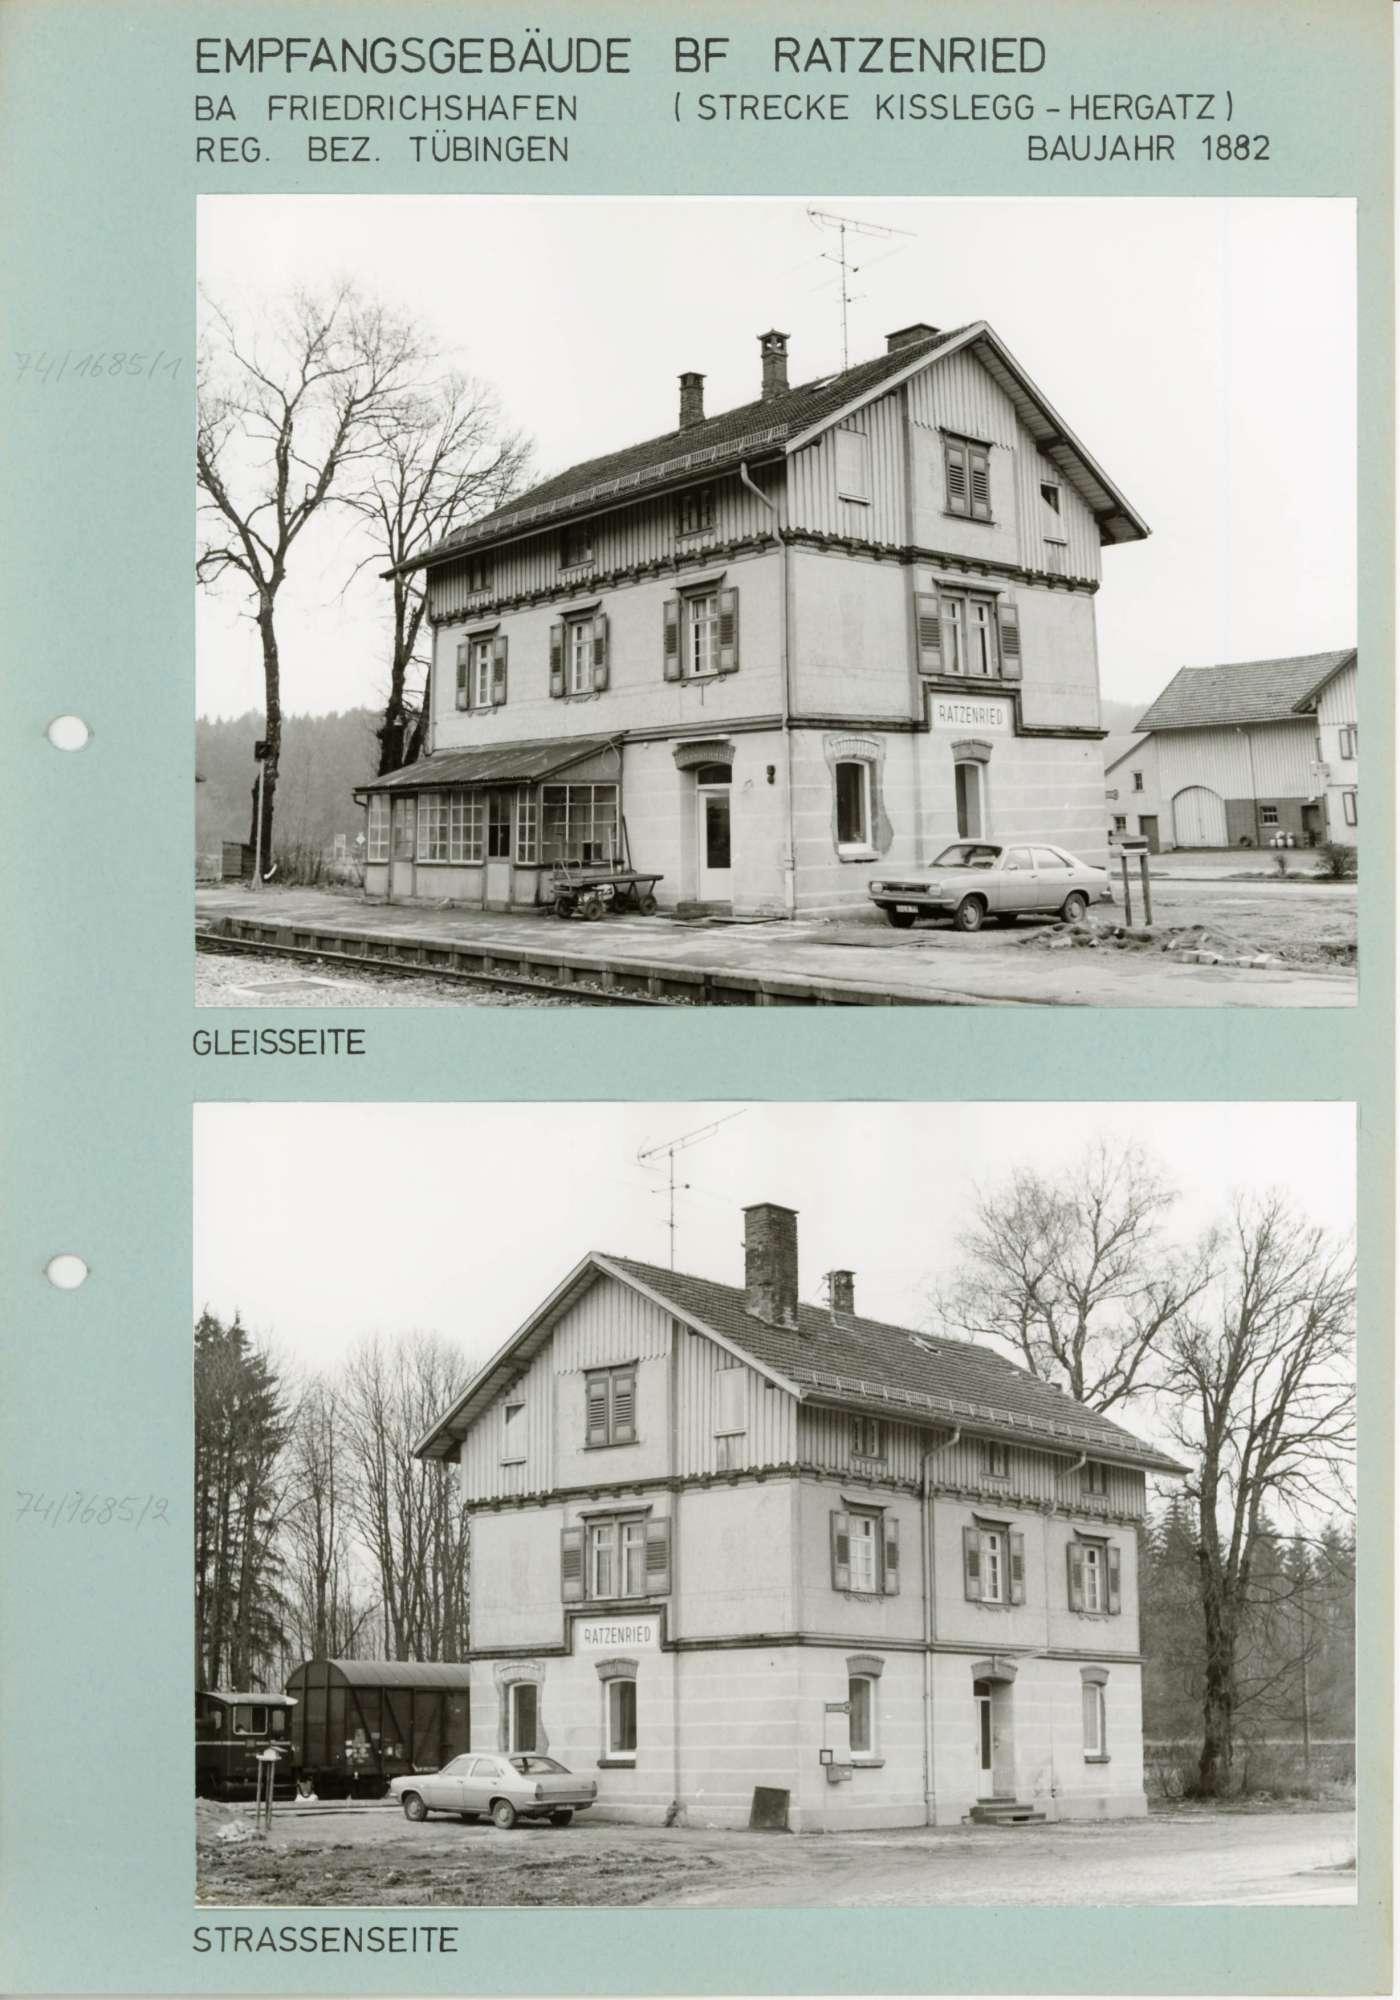 Ratzenried: 4 Fotos, Bild 2